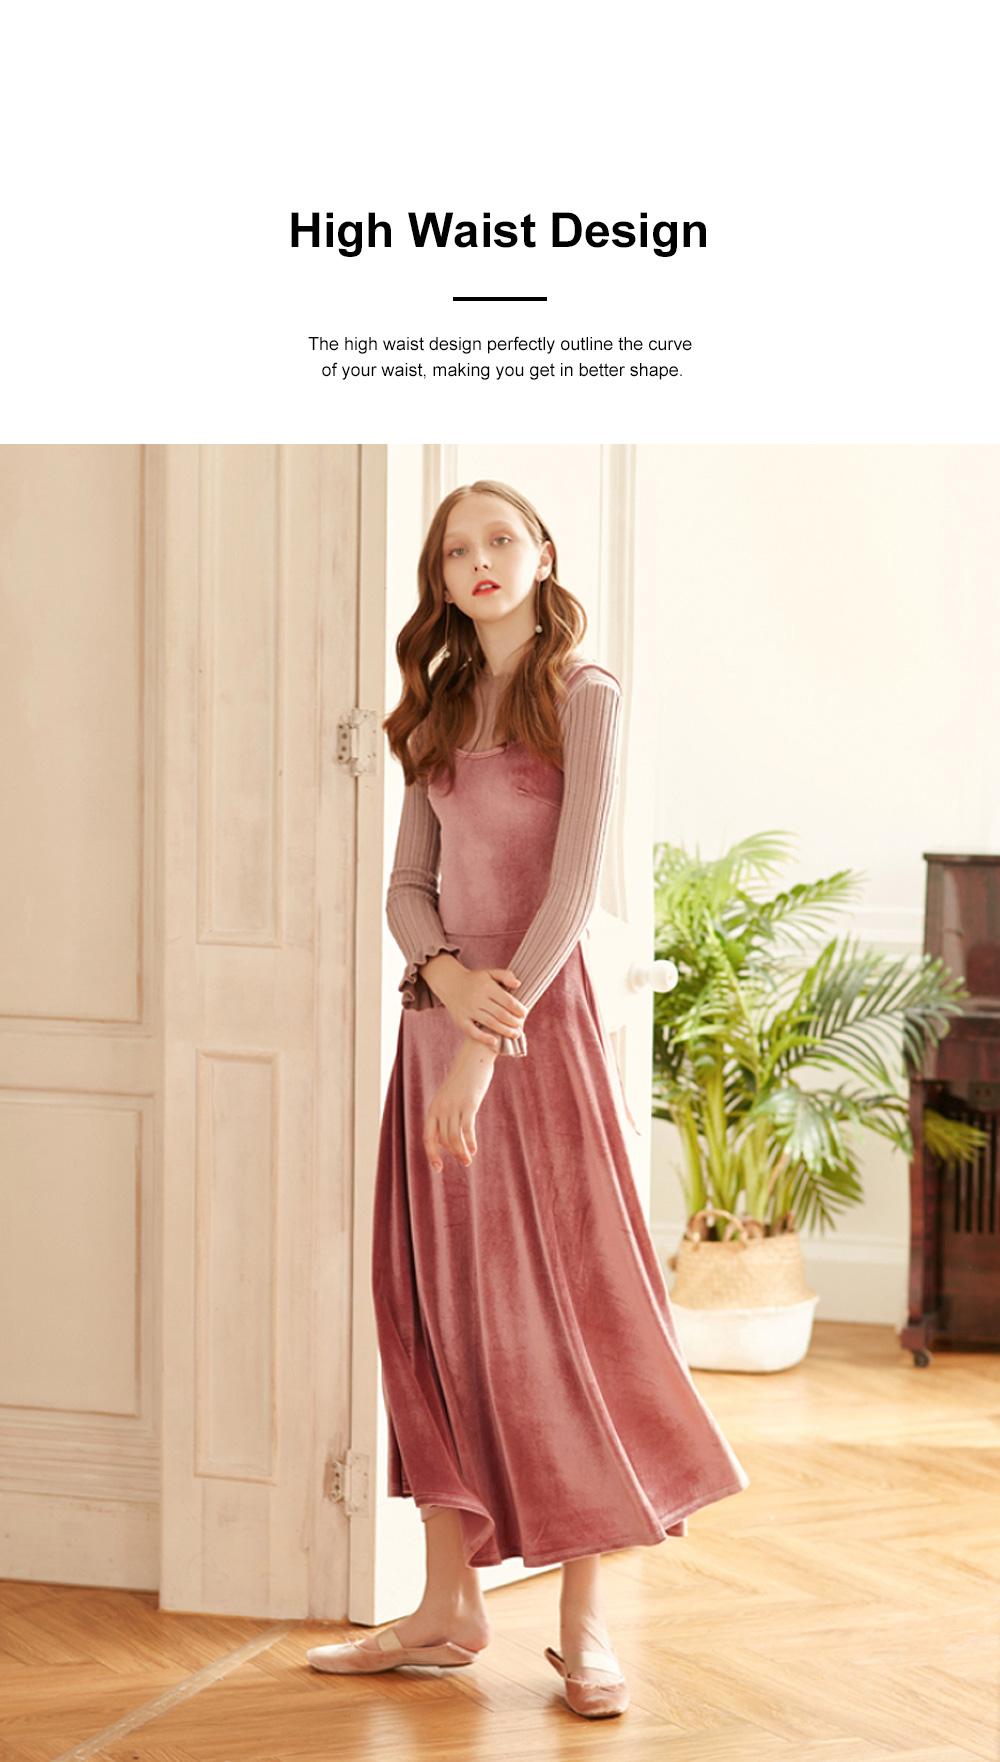 Women's Overall Suspender Dress Velvet Classic Retro Style with High Waist and Back Strap Ankle Length Bottoming Vest Skirt 3